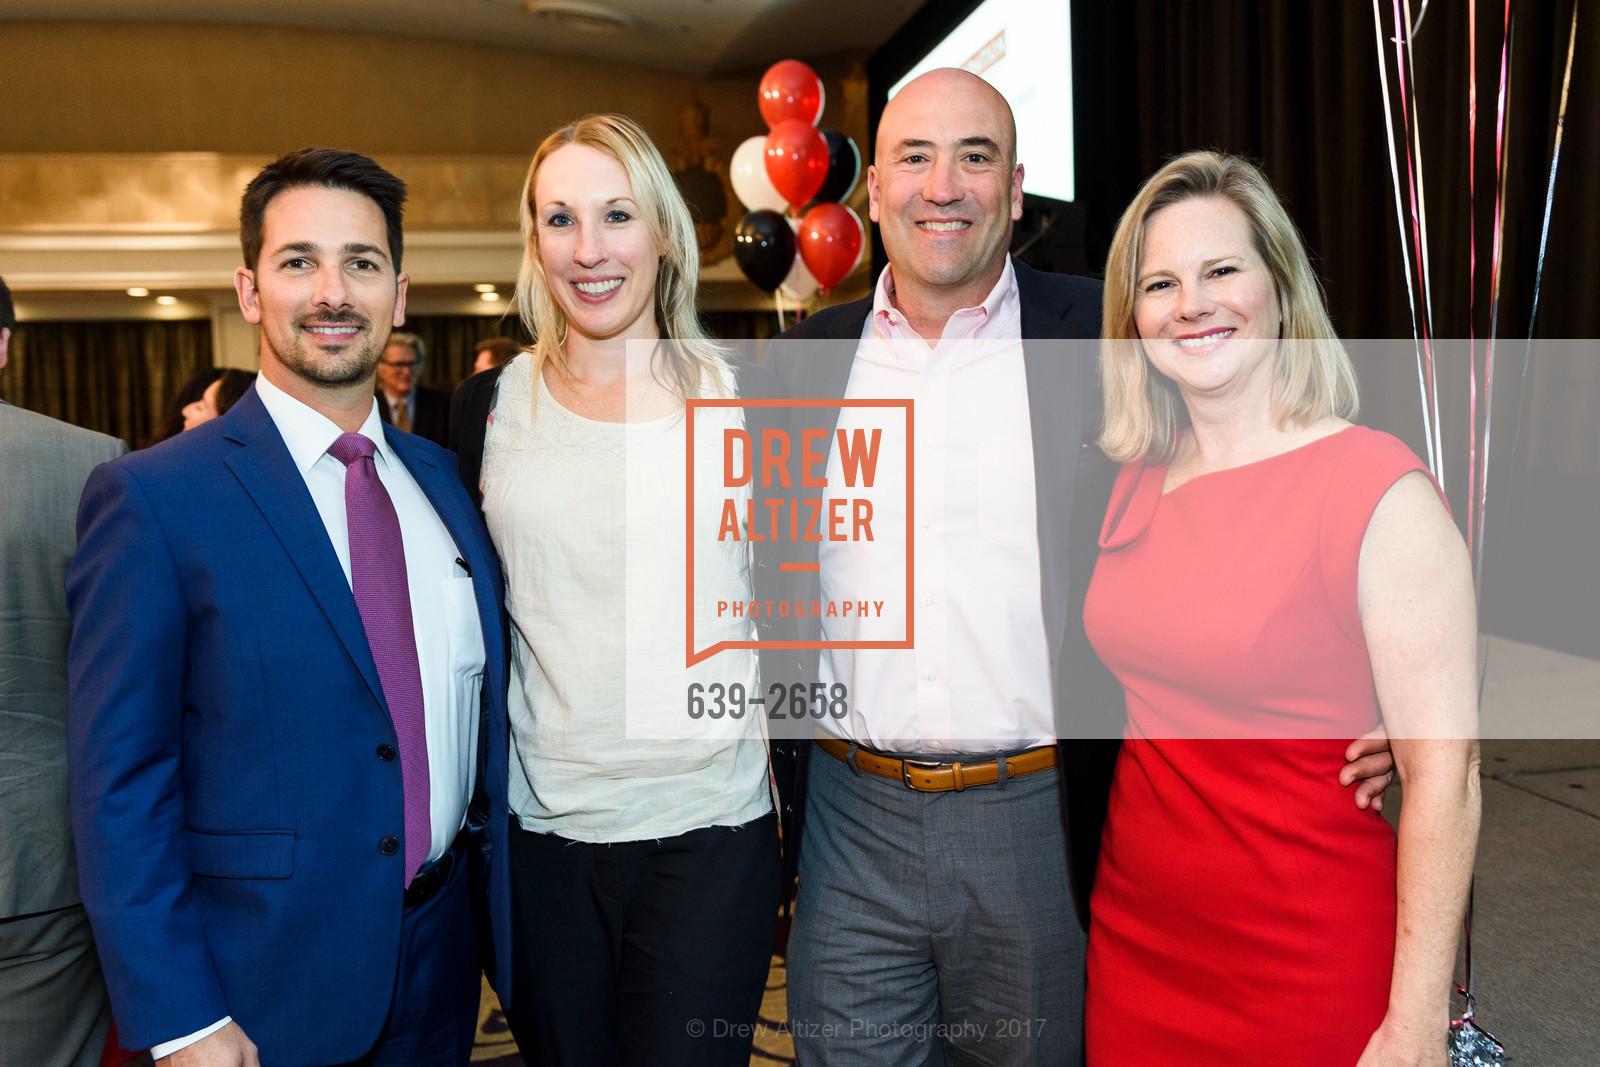 Victor Olivieri, Audrey Murray, Derek Remski, Kat Anderson, Photo #639-2658